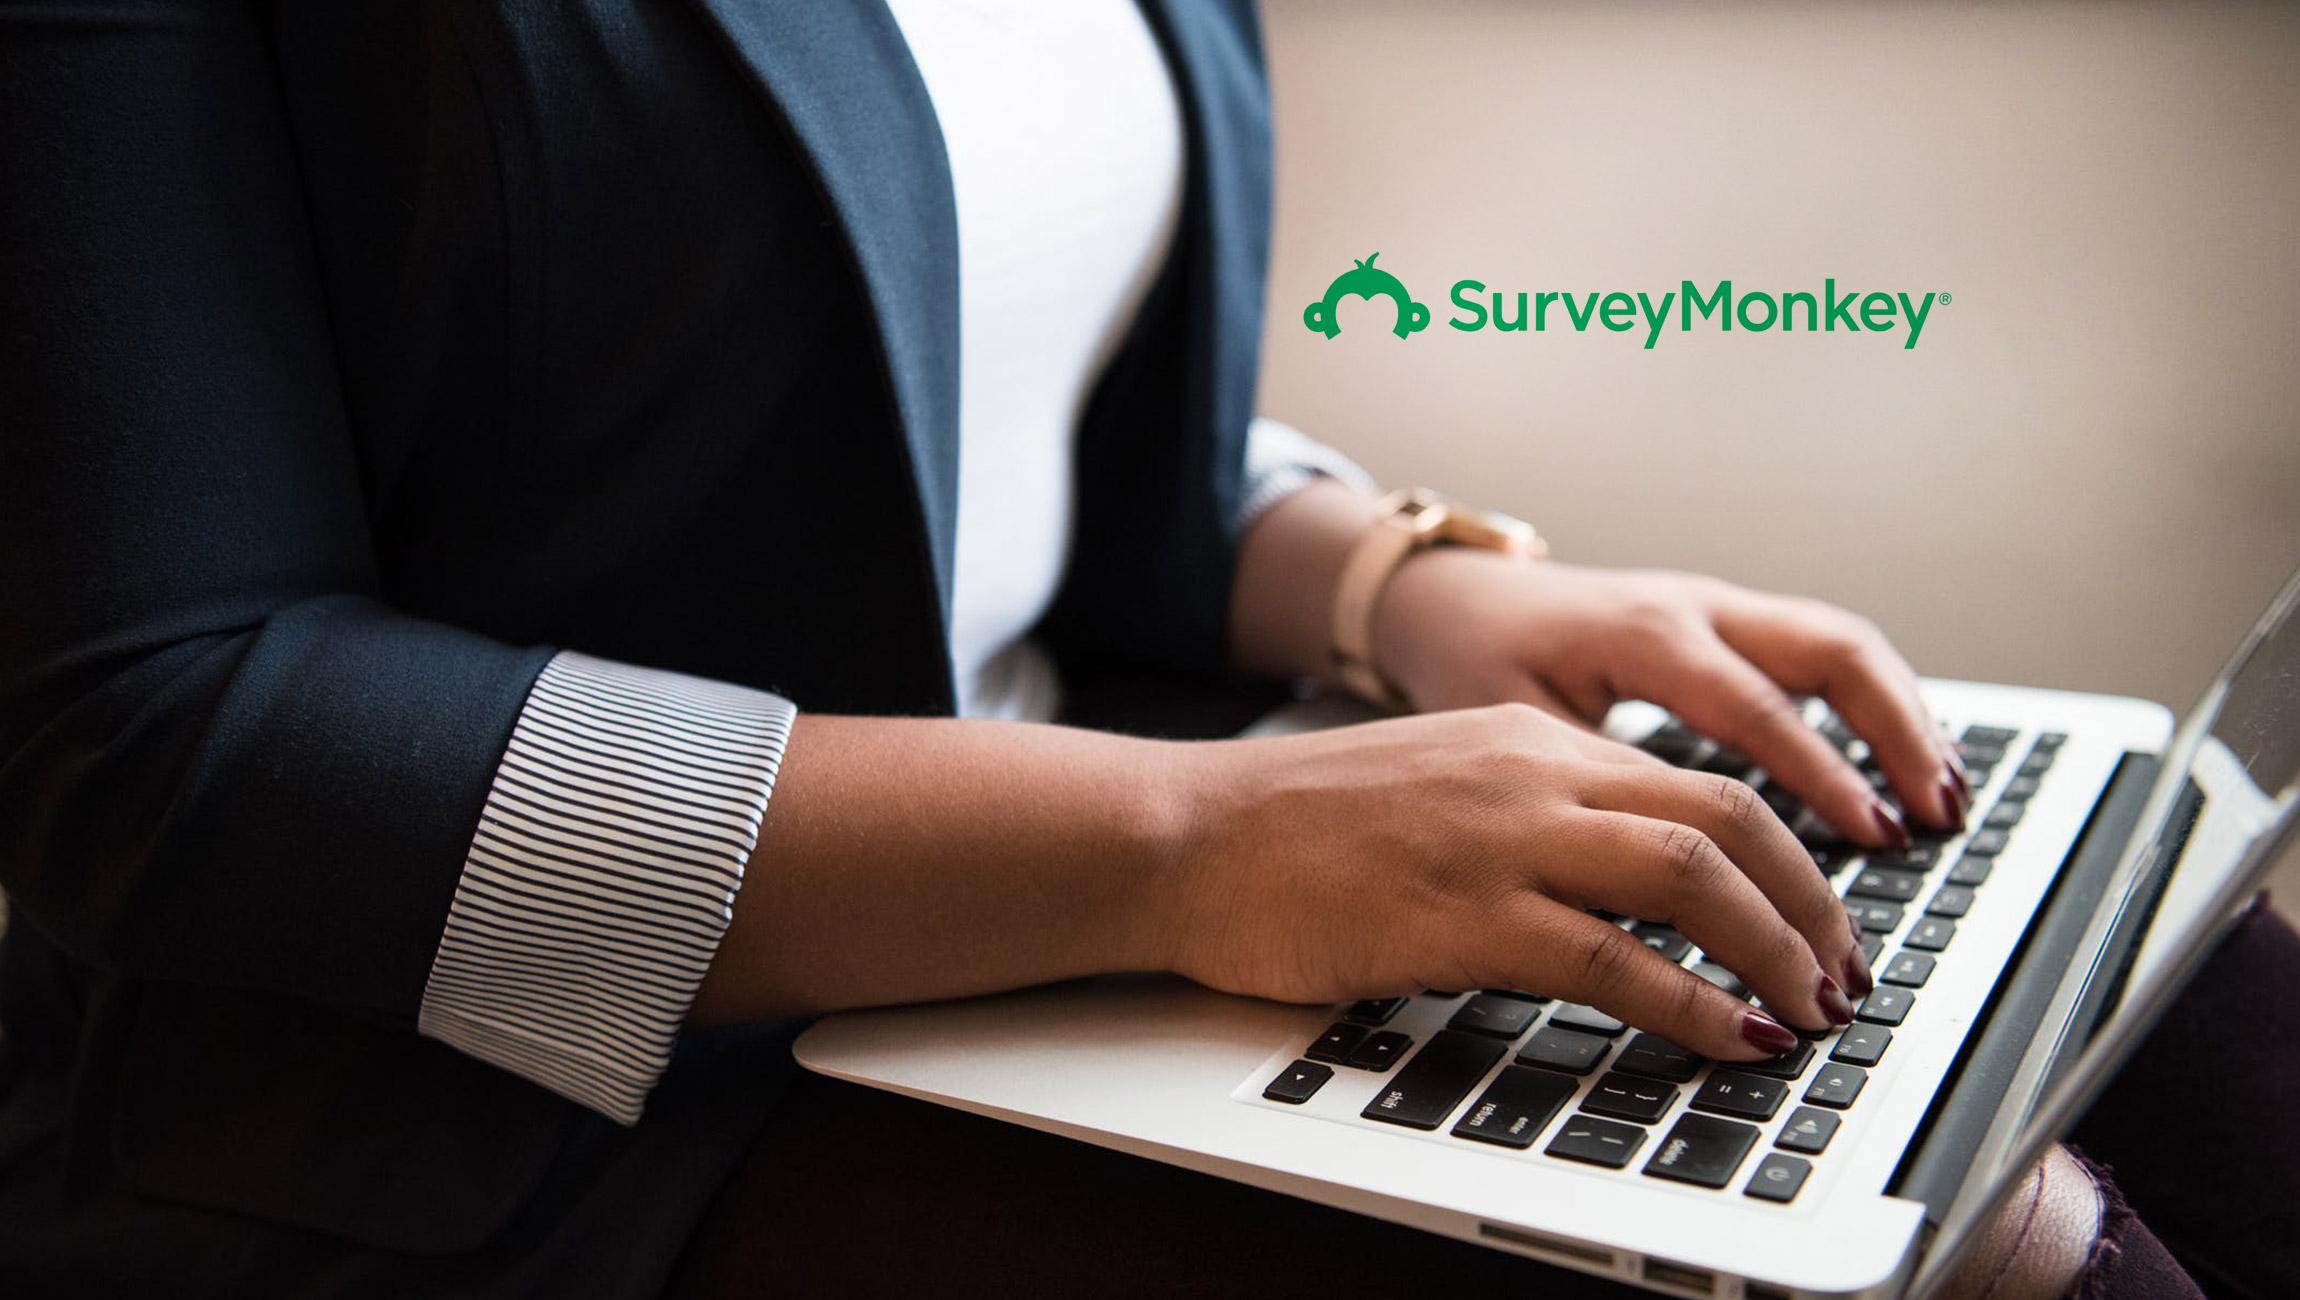 SurveyMonkey Teams Up with Zoom to Enhance the Virtual Employee Feedback Experience